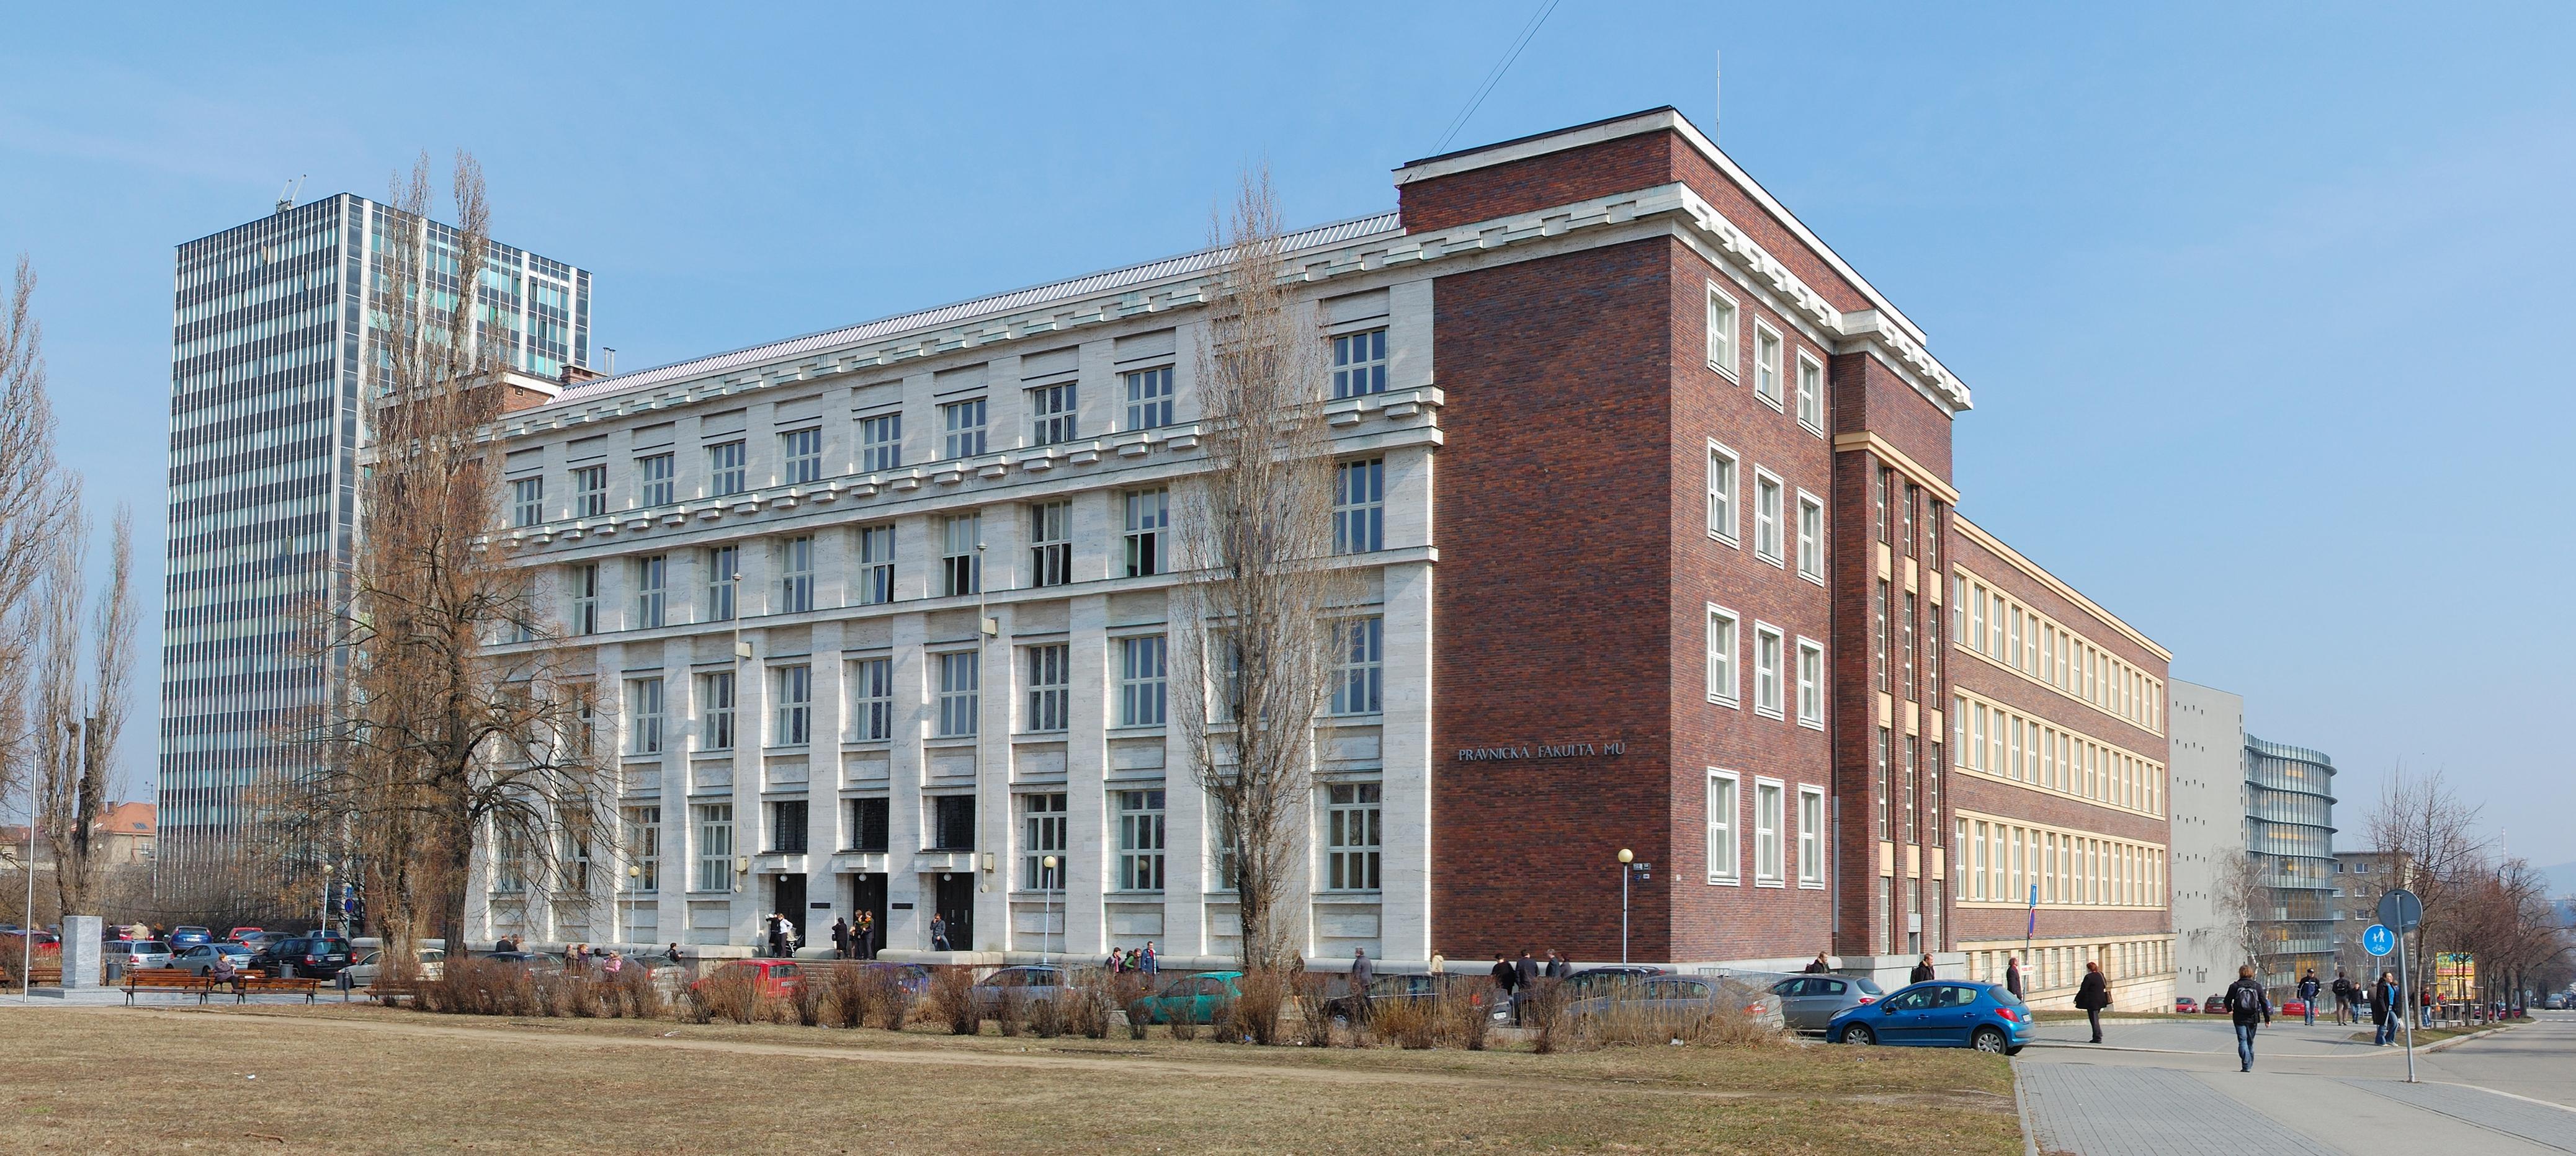 https://upload.wikimedia.org/wikipedia/commons/5/5e/Pravnicka_Fakulta_Masarykovy_Univerzity_Brno_2010.jpg